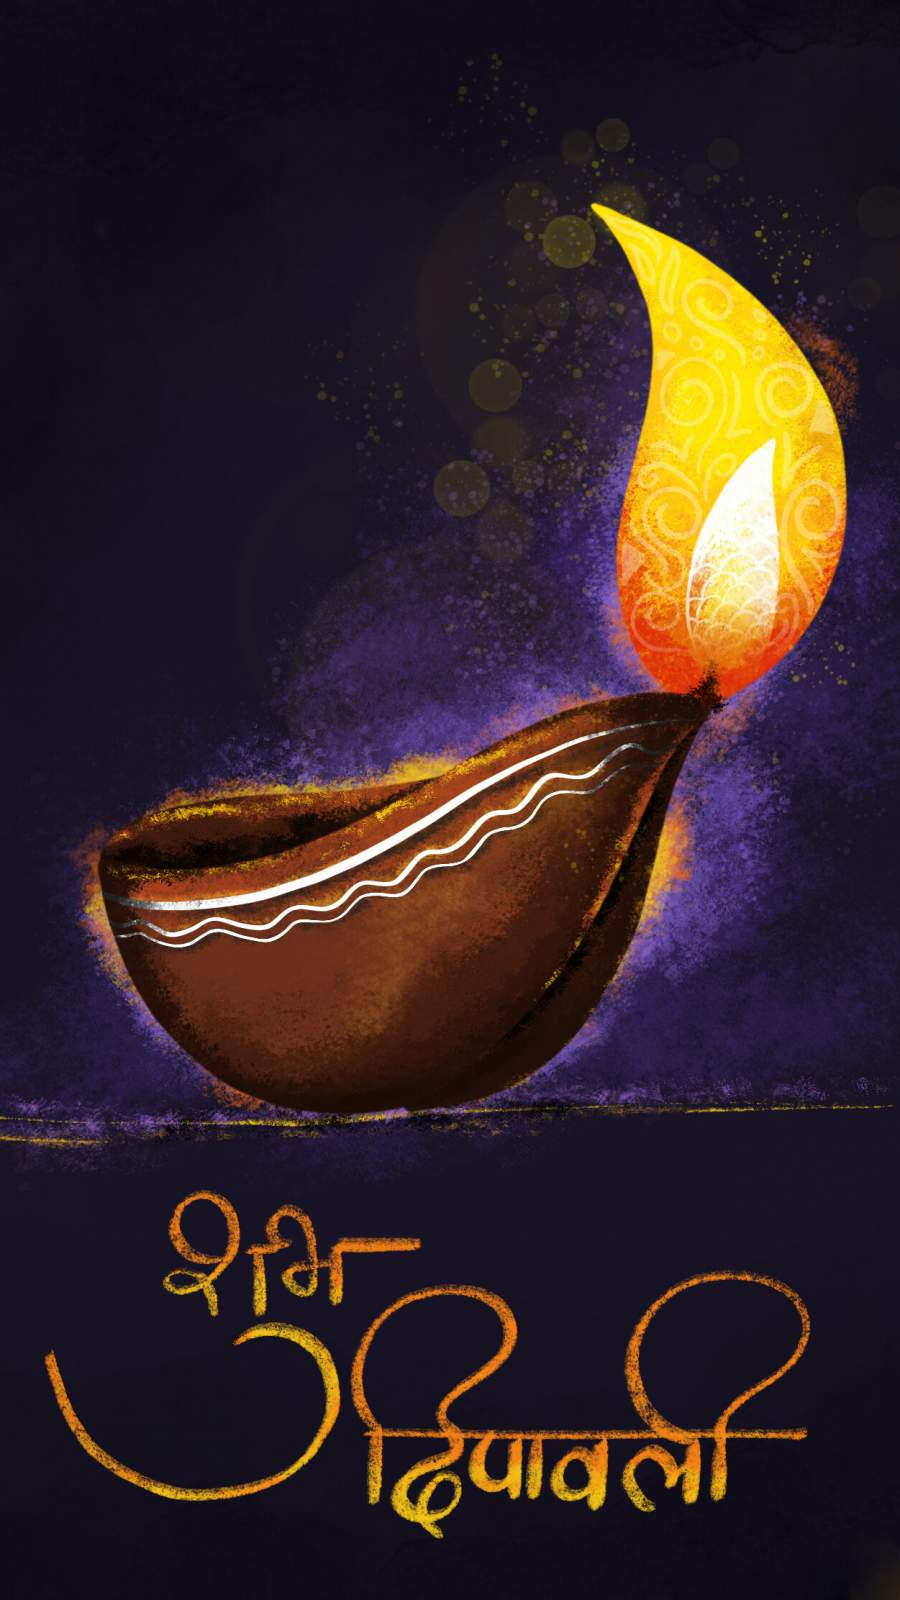 Happy Diwali iPhone Wallpaper